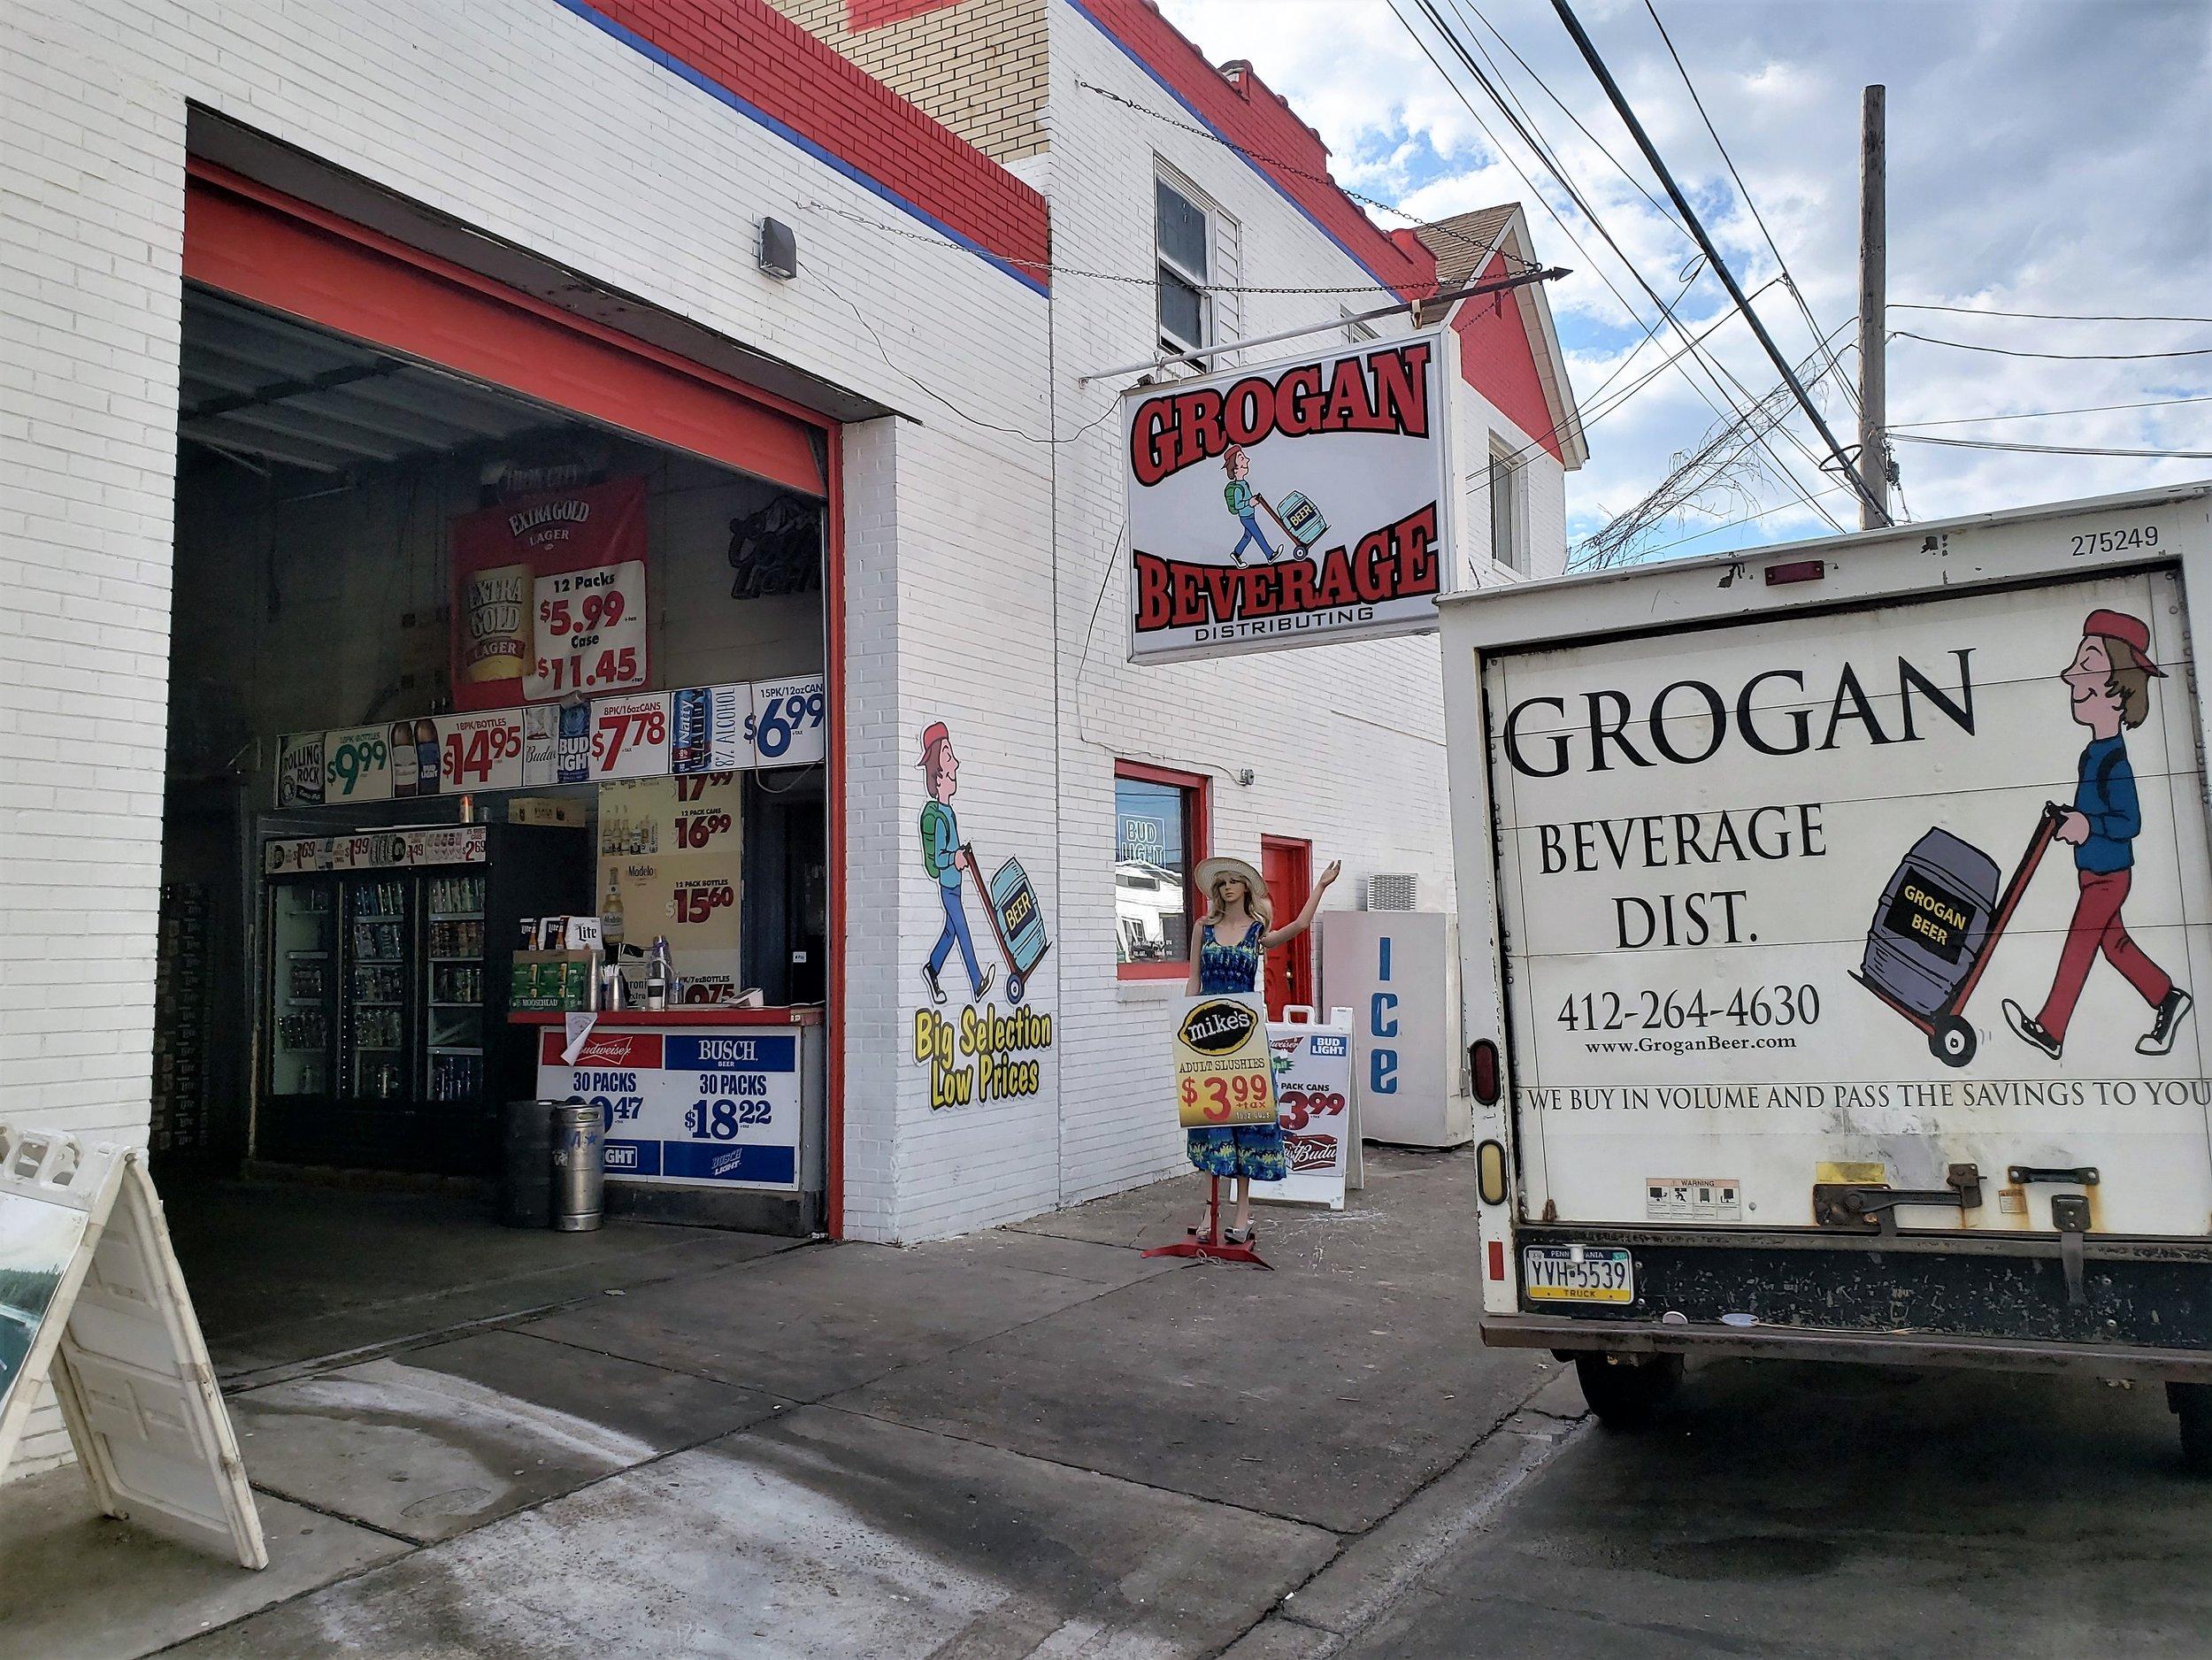 Grogan Beverage Distributors - 840 4th Ave, (412) 264-4630